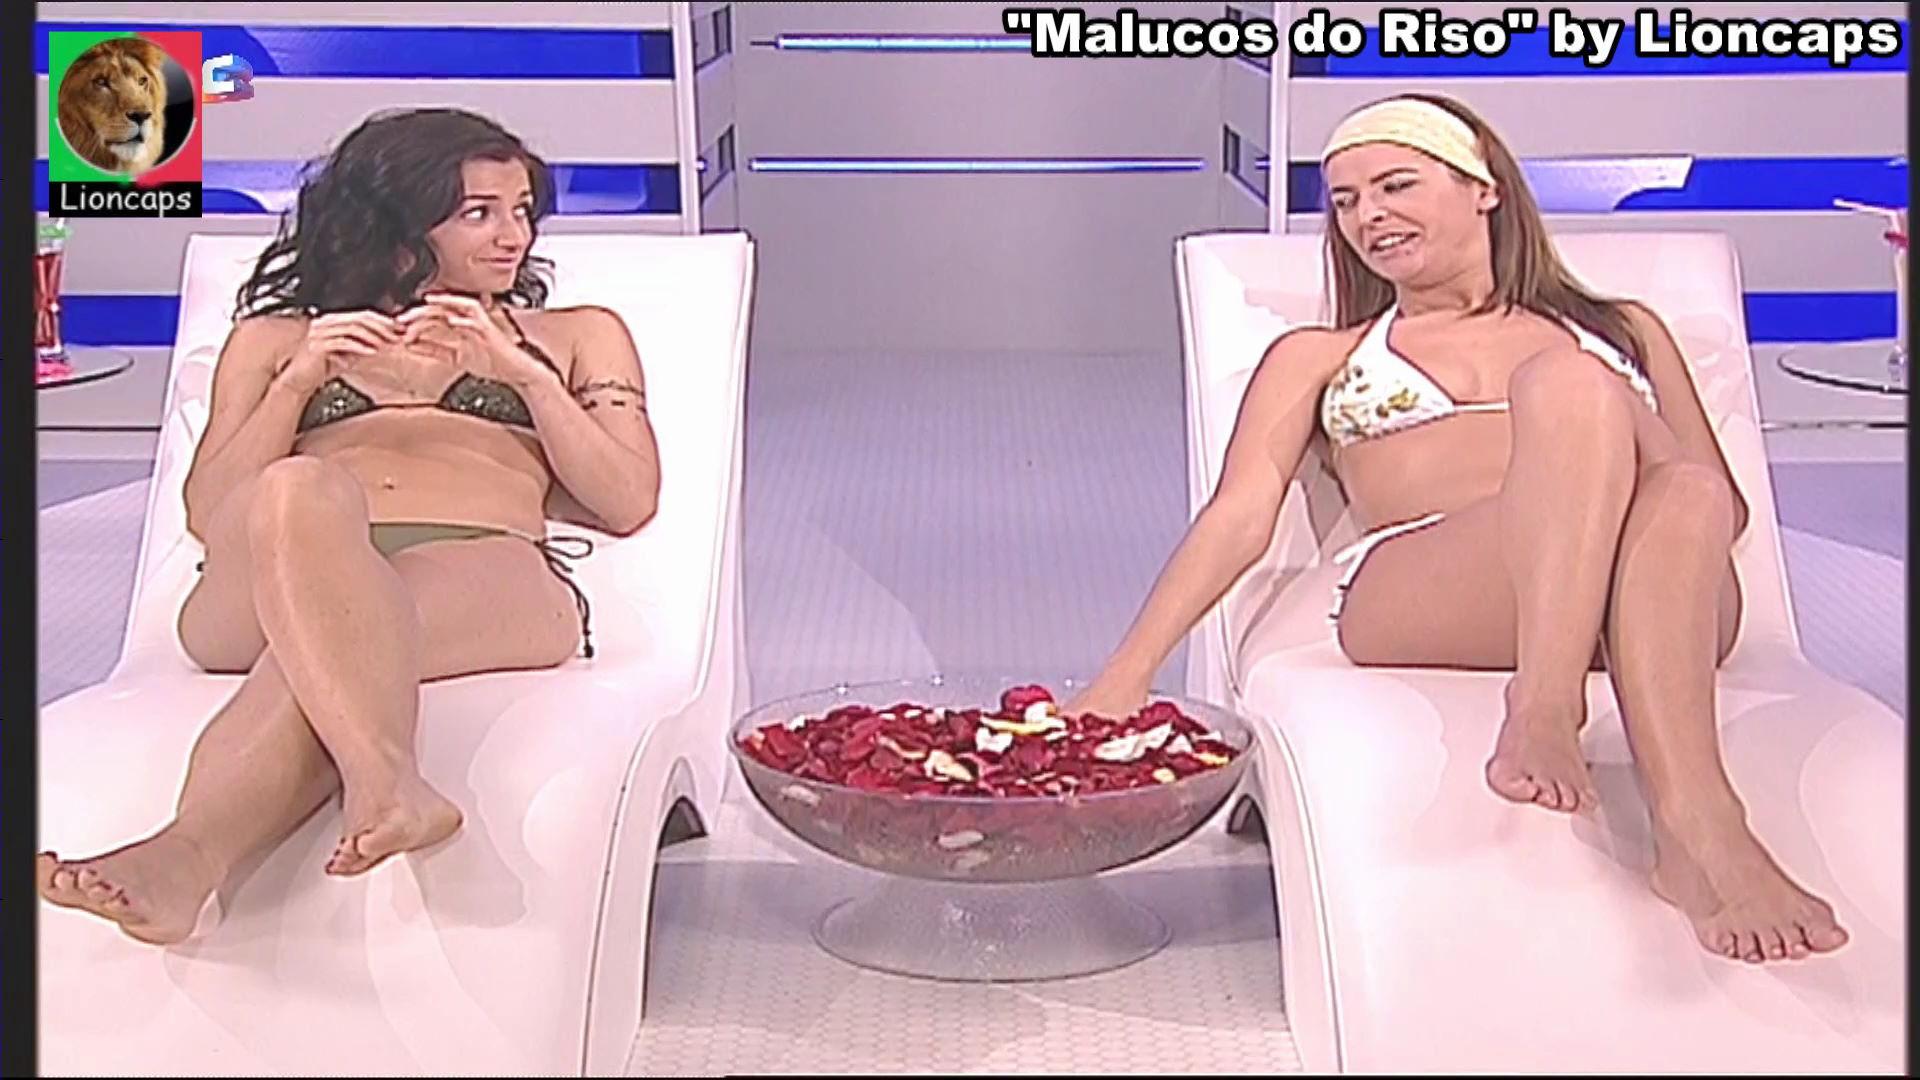 475199536_malucos_riso_alda_gomes_vs190malucos_riso_602_15094_122_491lo.JPG